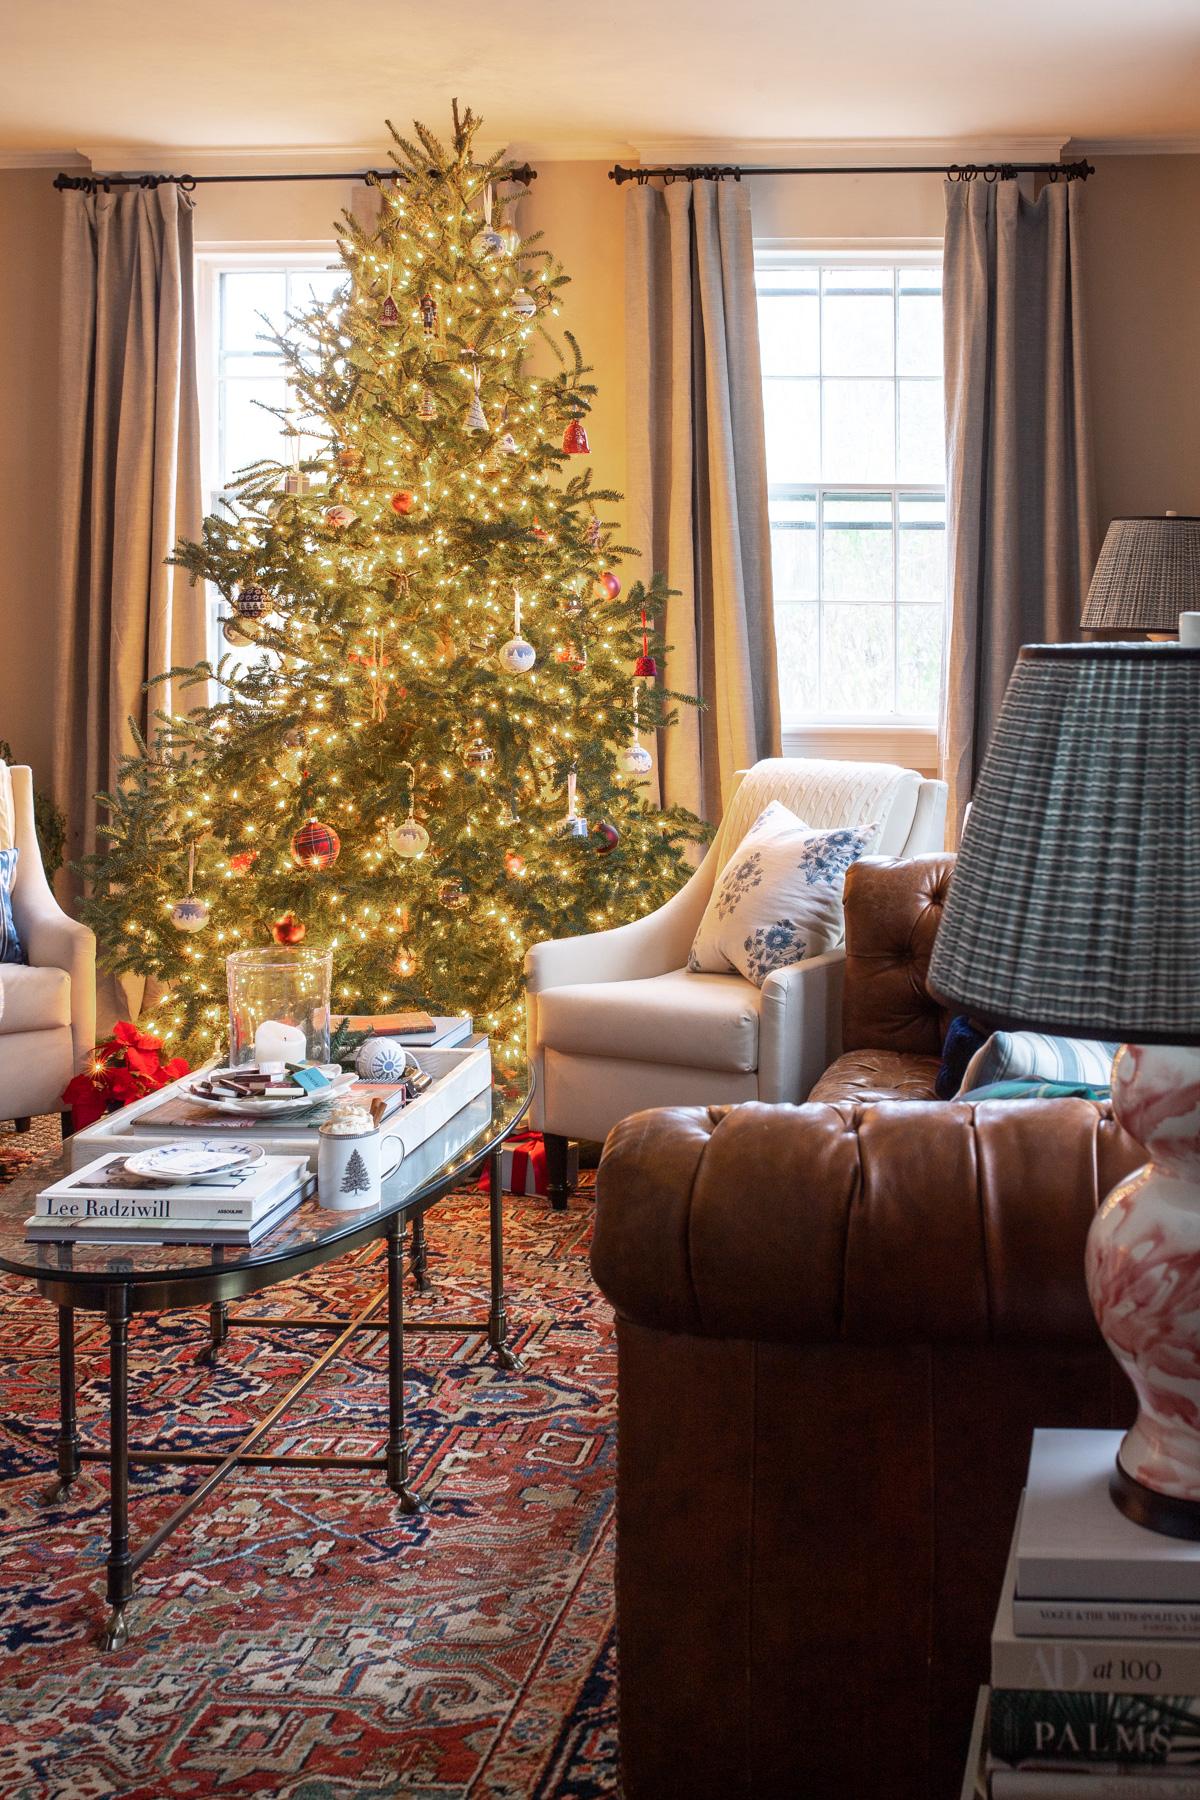 Stacie Flinner x New England Holiday Decorations-17.jpg